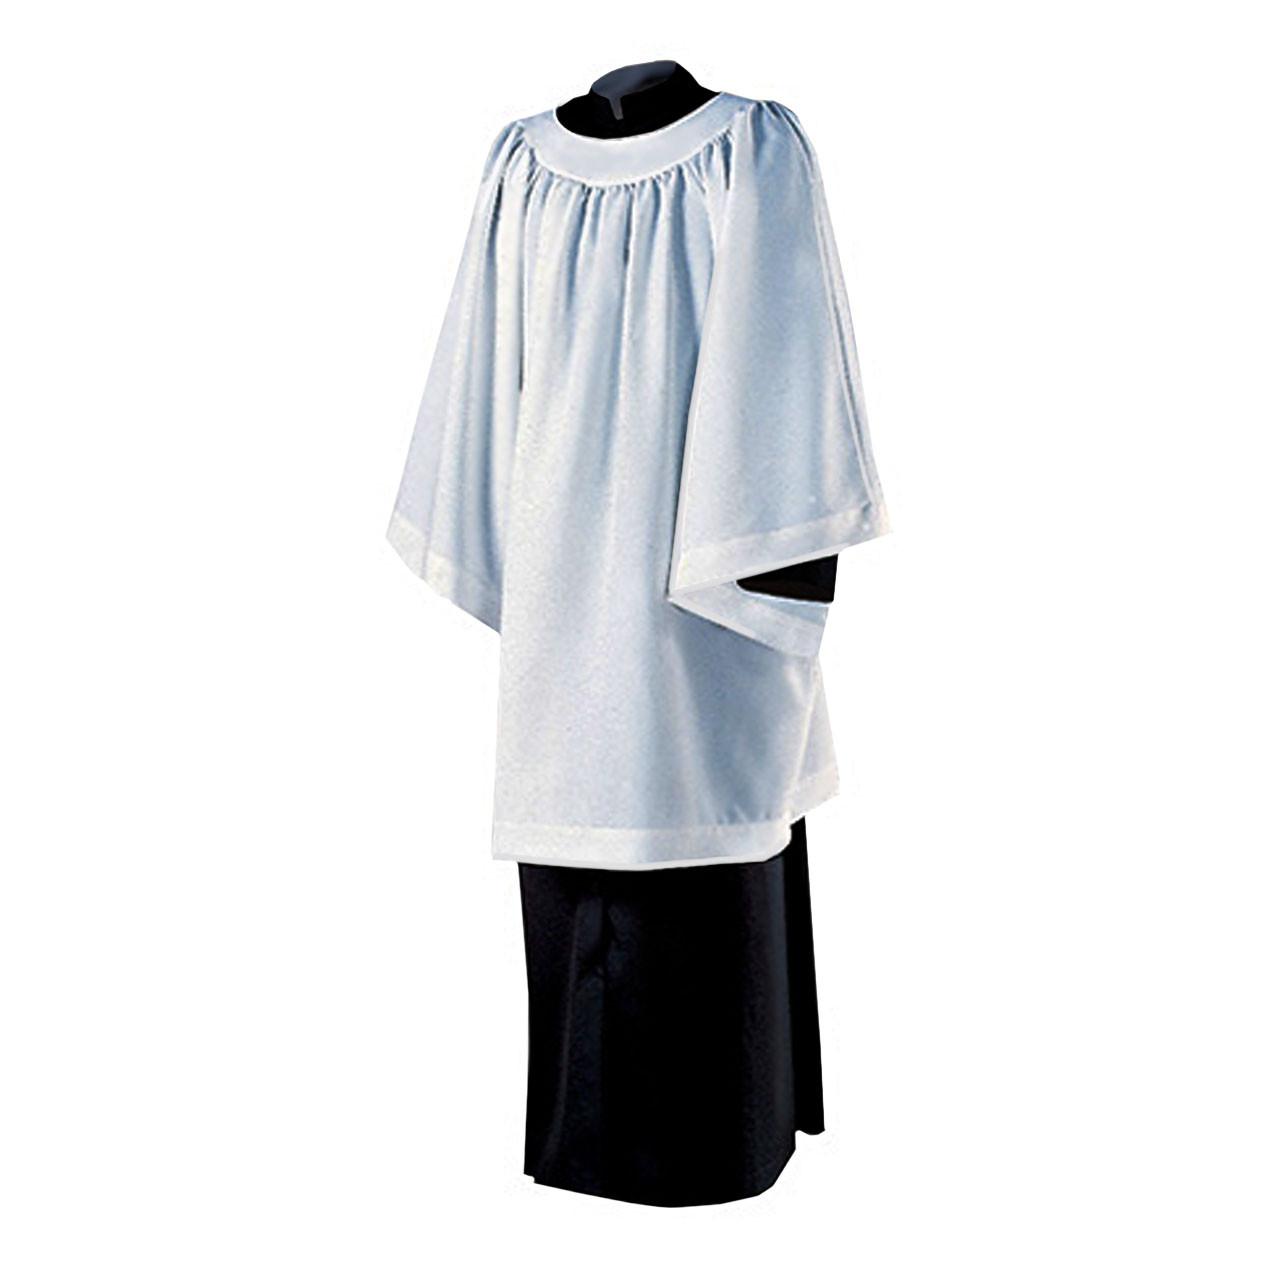 335 Liturgical Surplice Medium